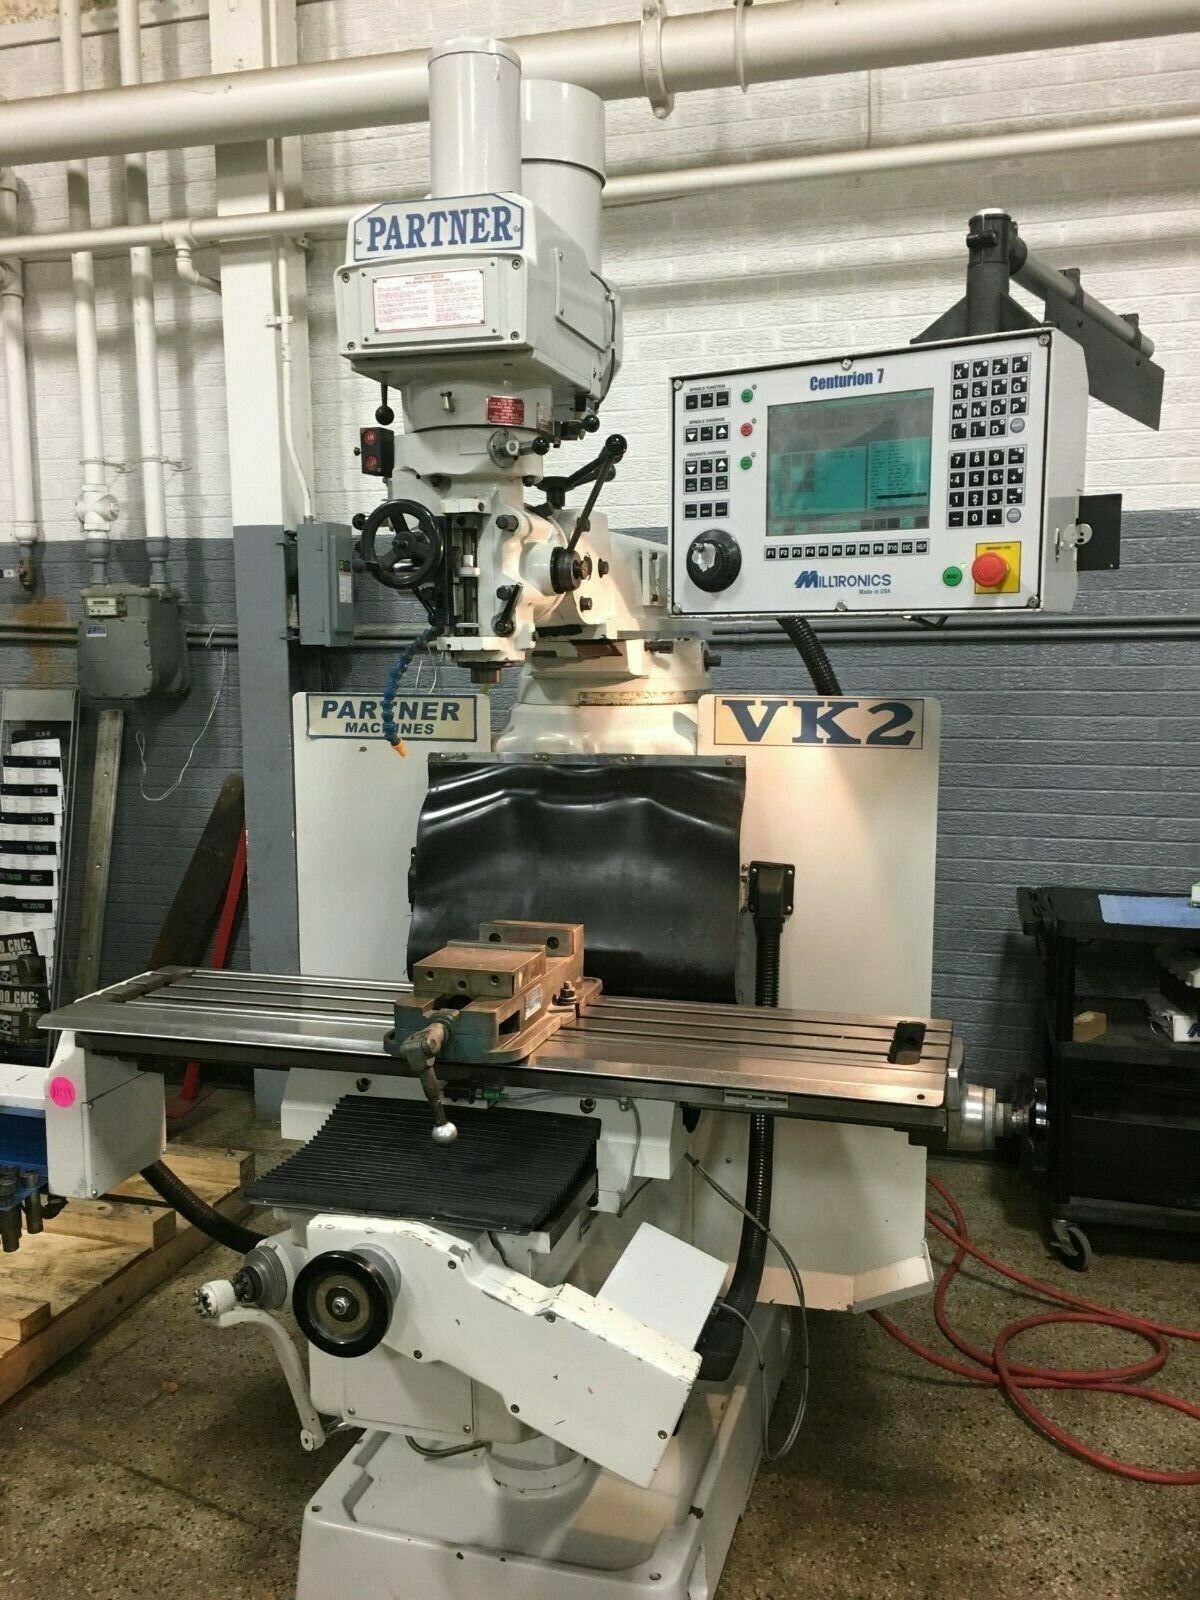 Milltronics Model VK2 CNC Vertical Mill, S/N 9268, New 2006.